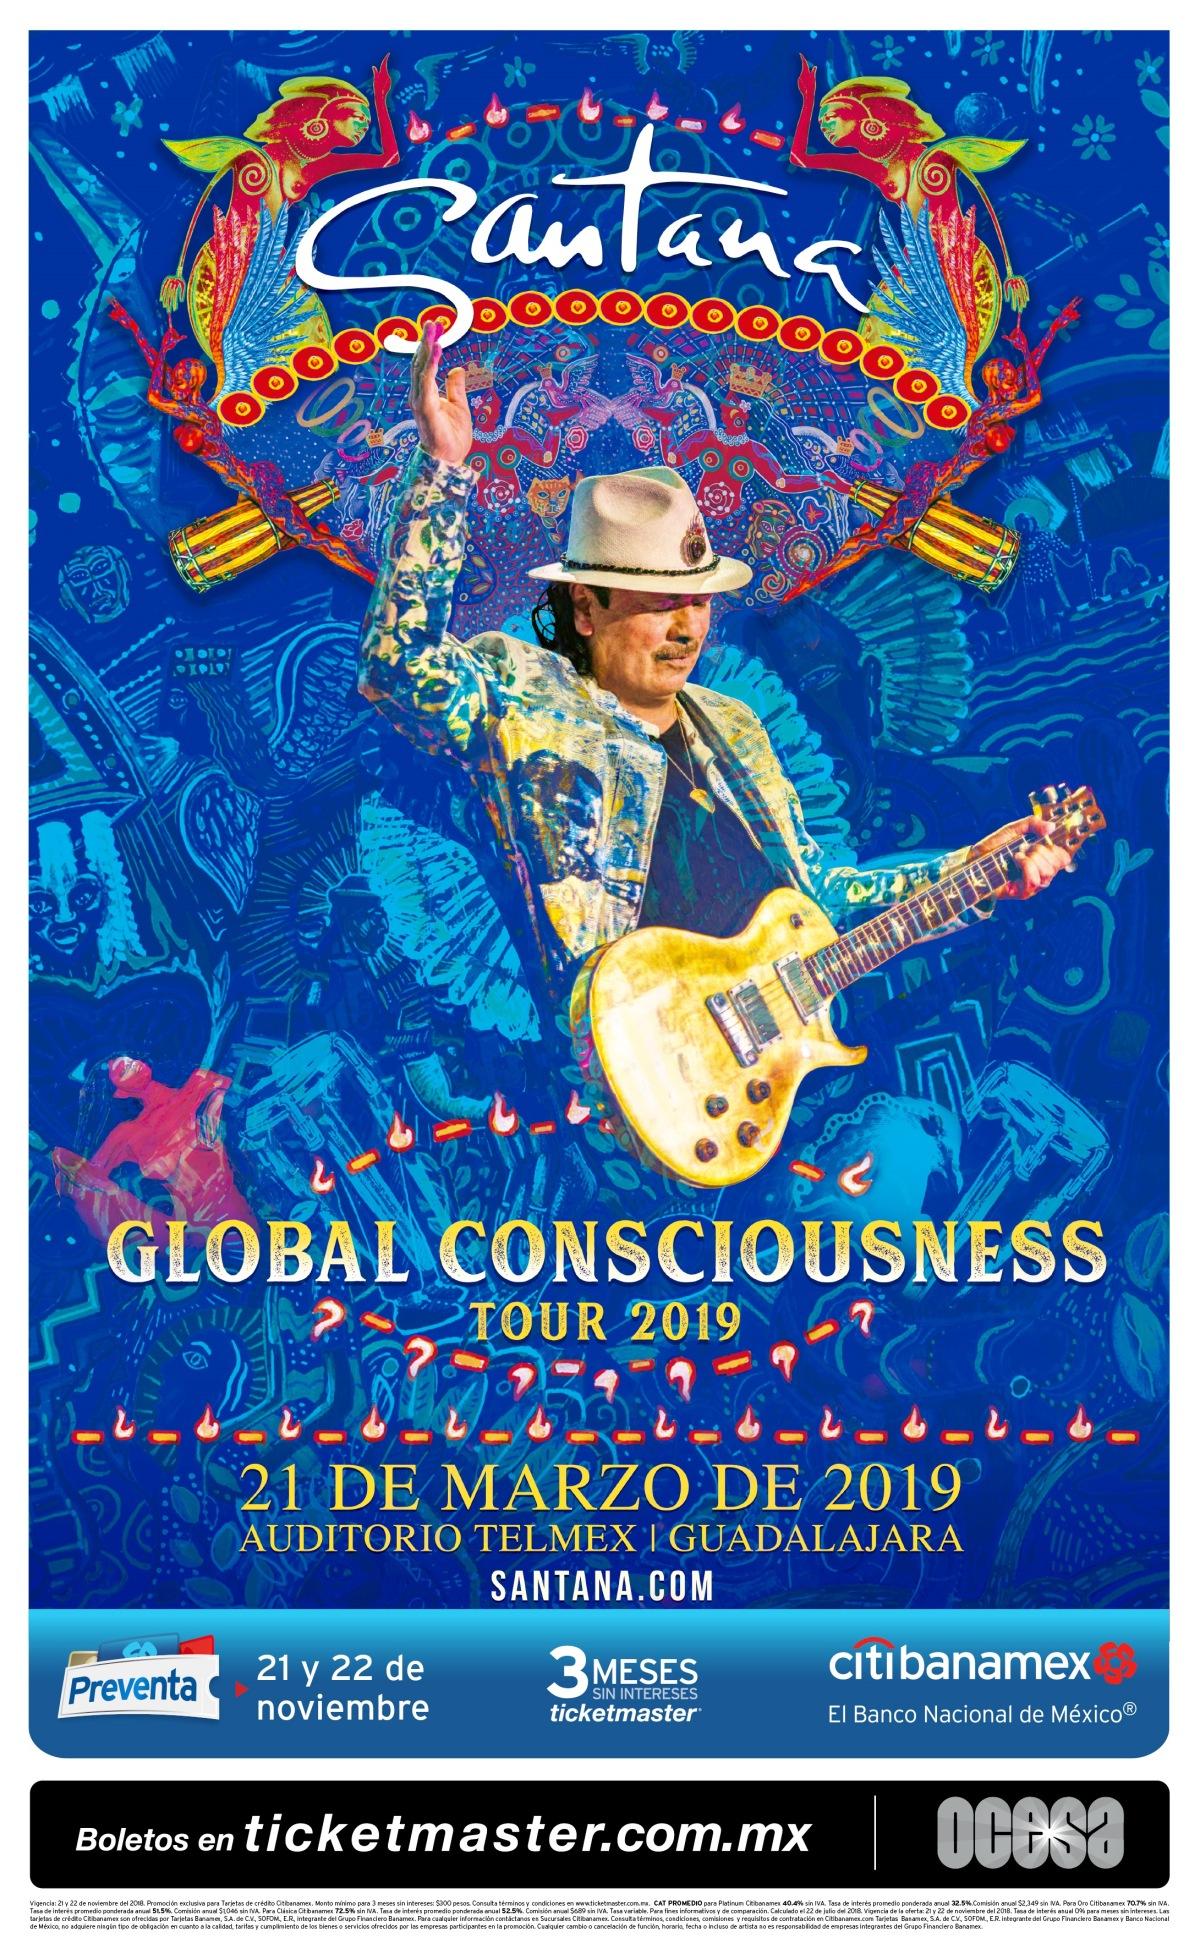 Carlos Santana traerá su Global Consciousness a México en abril de2019